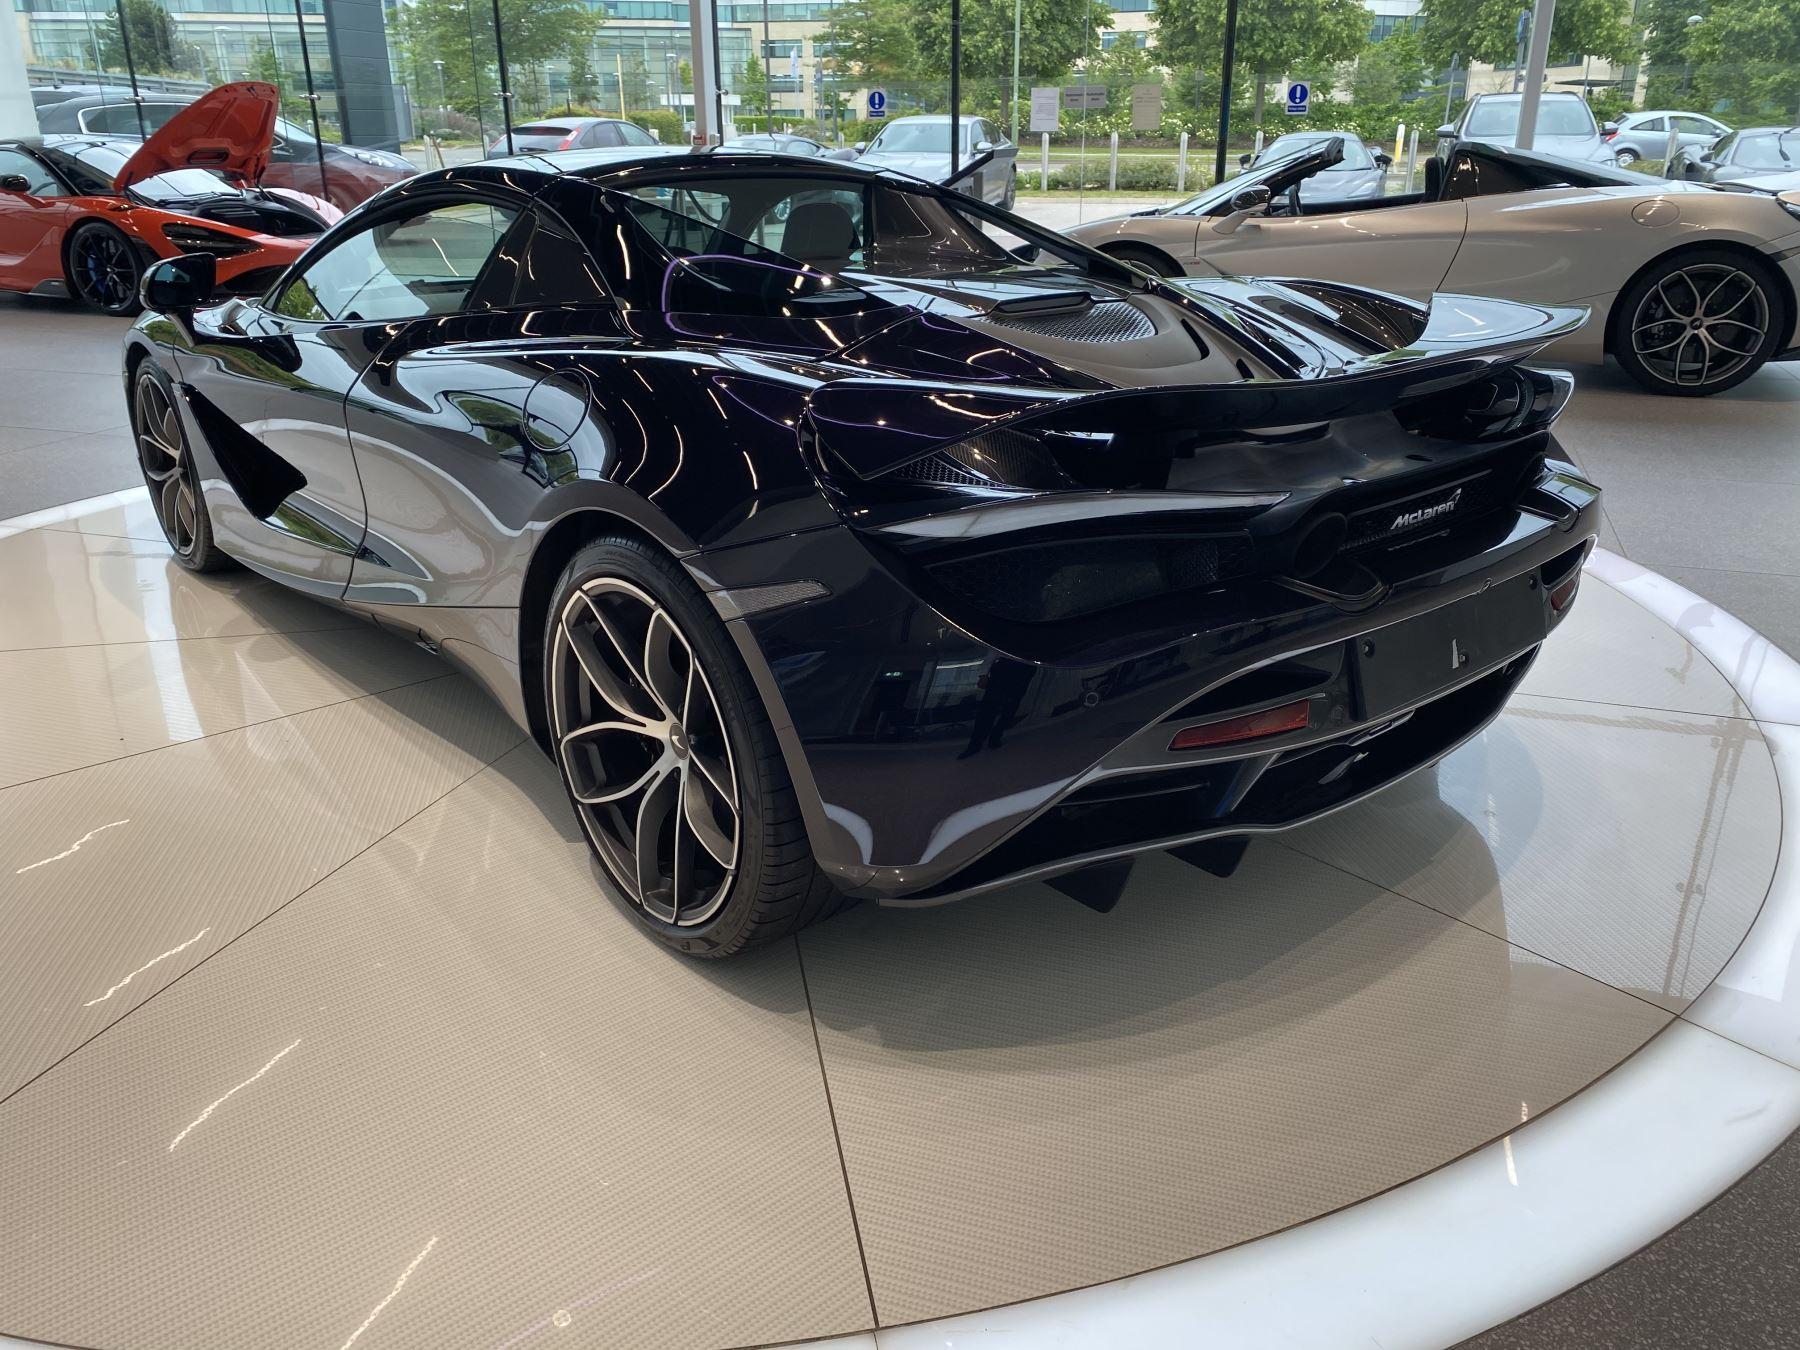 McLaren 720S Spider V8 2dr SSG  MSO PAINT SPOORTS EXHAUST SUPERB VALUE image 6